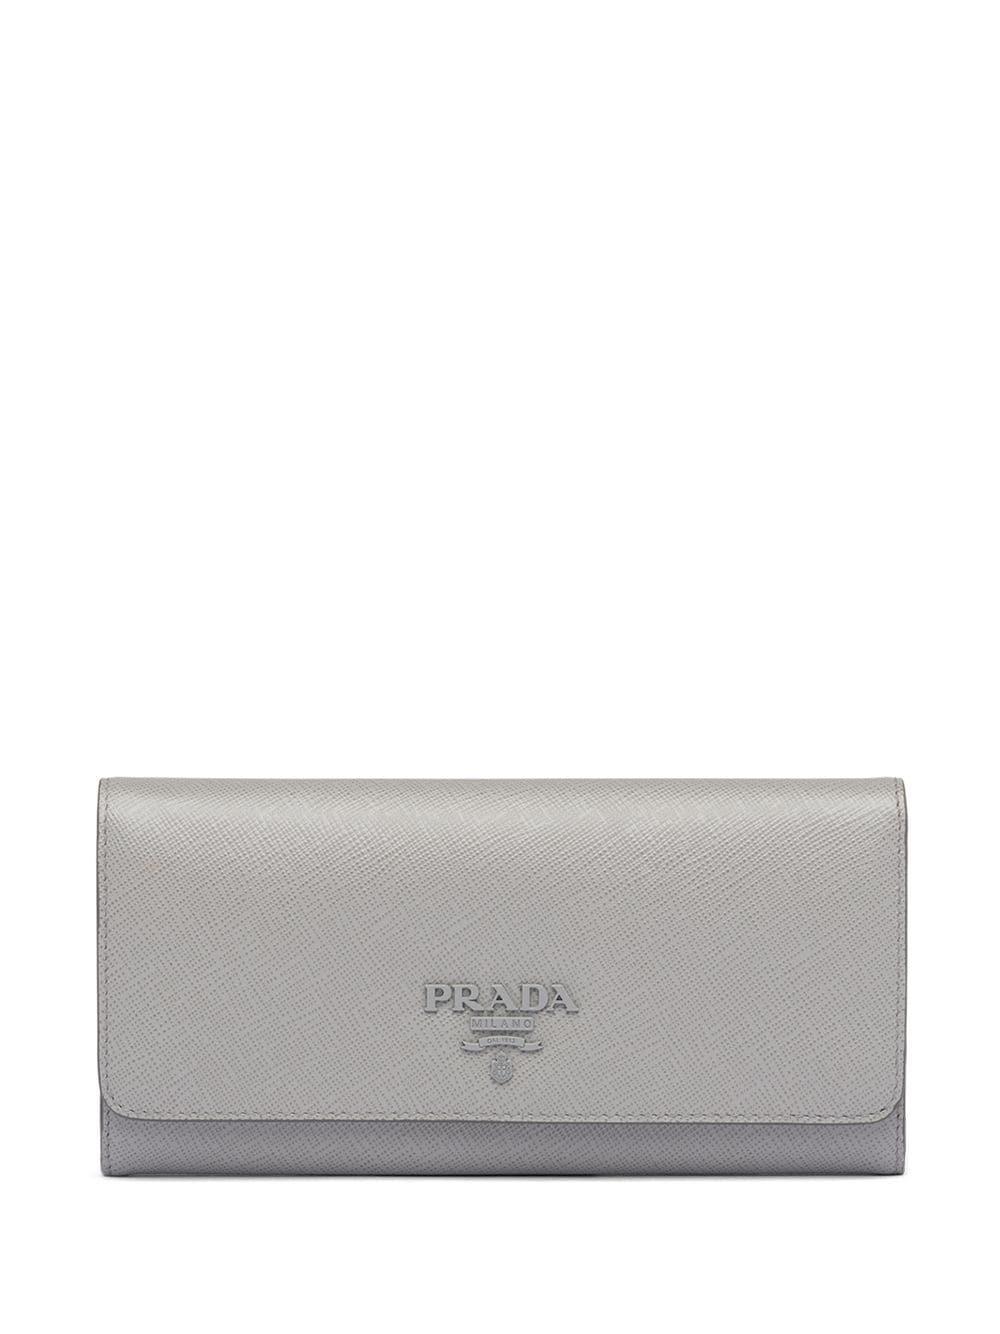 Prada Portemonnaie mit Logo-Schild - Grau